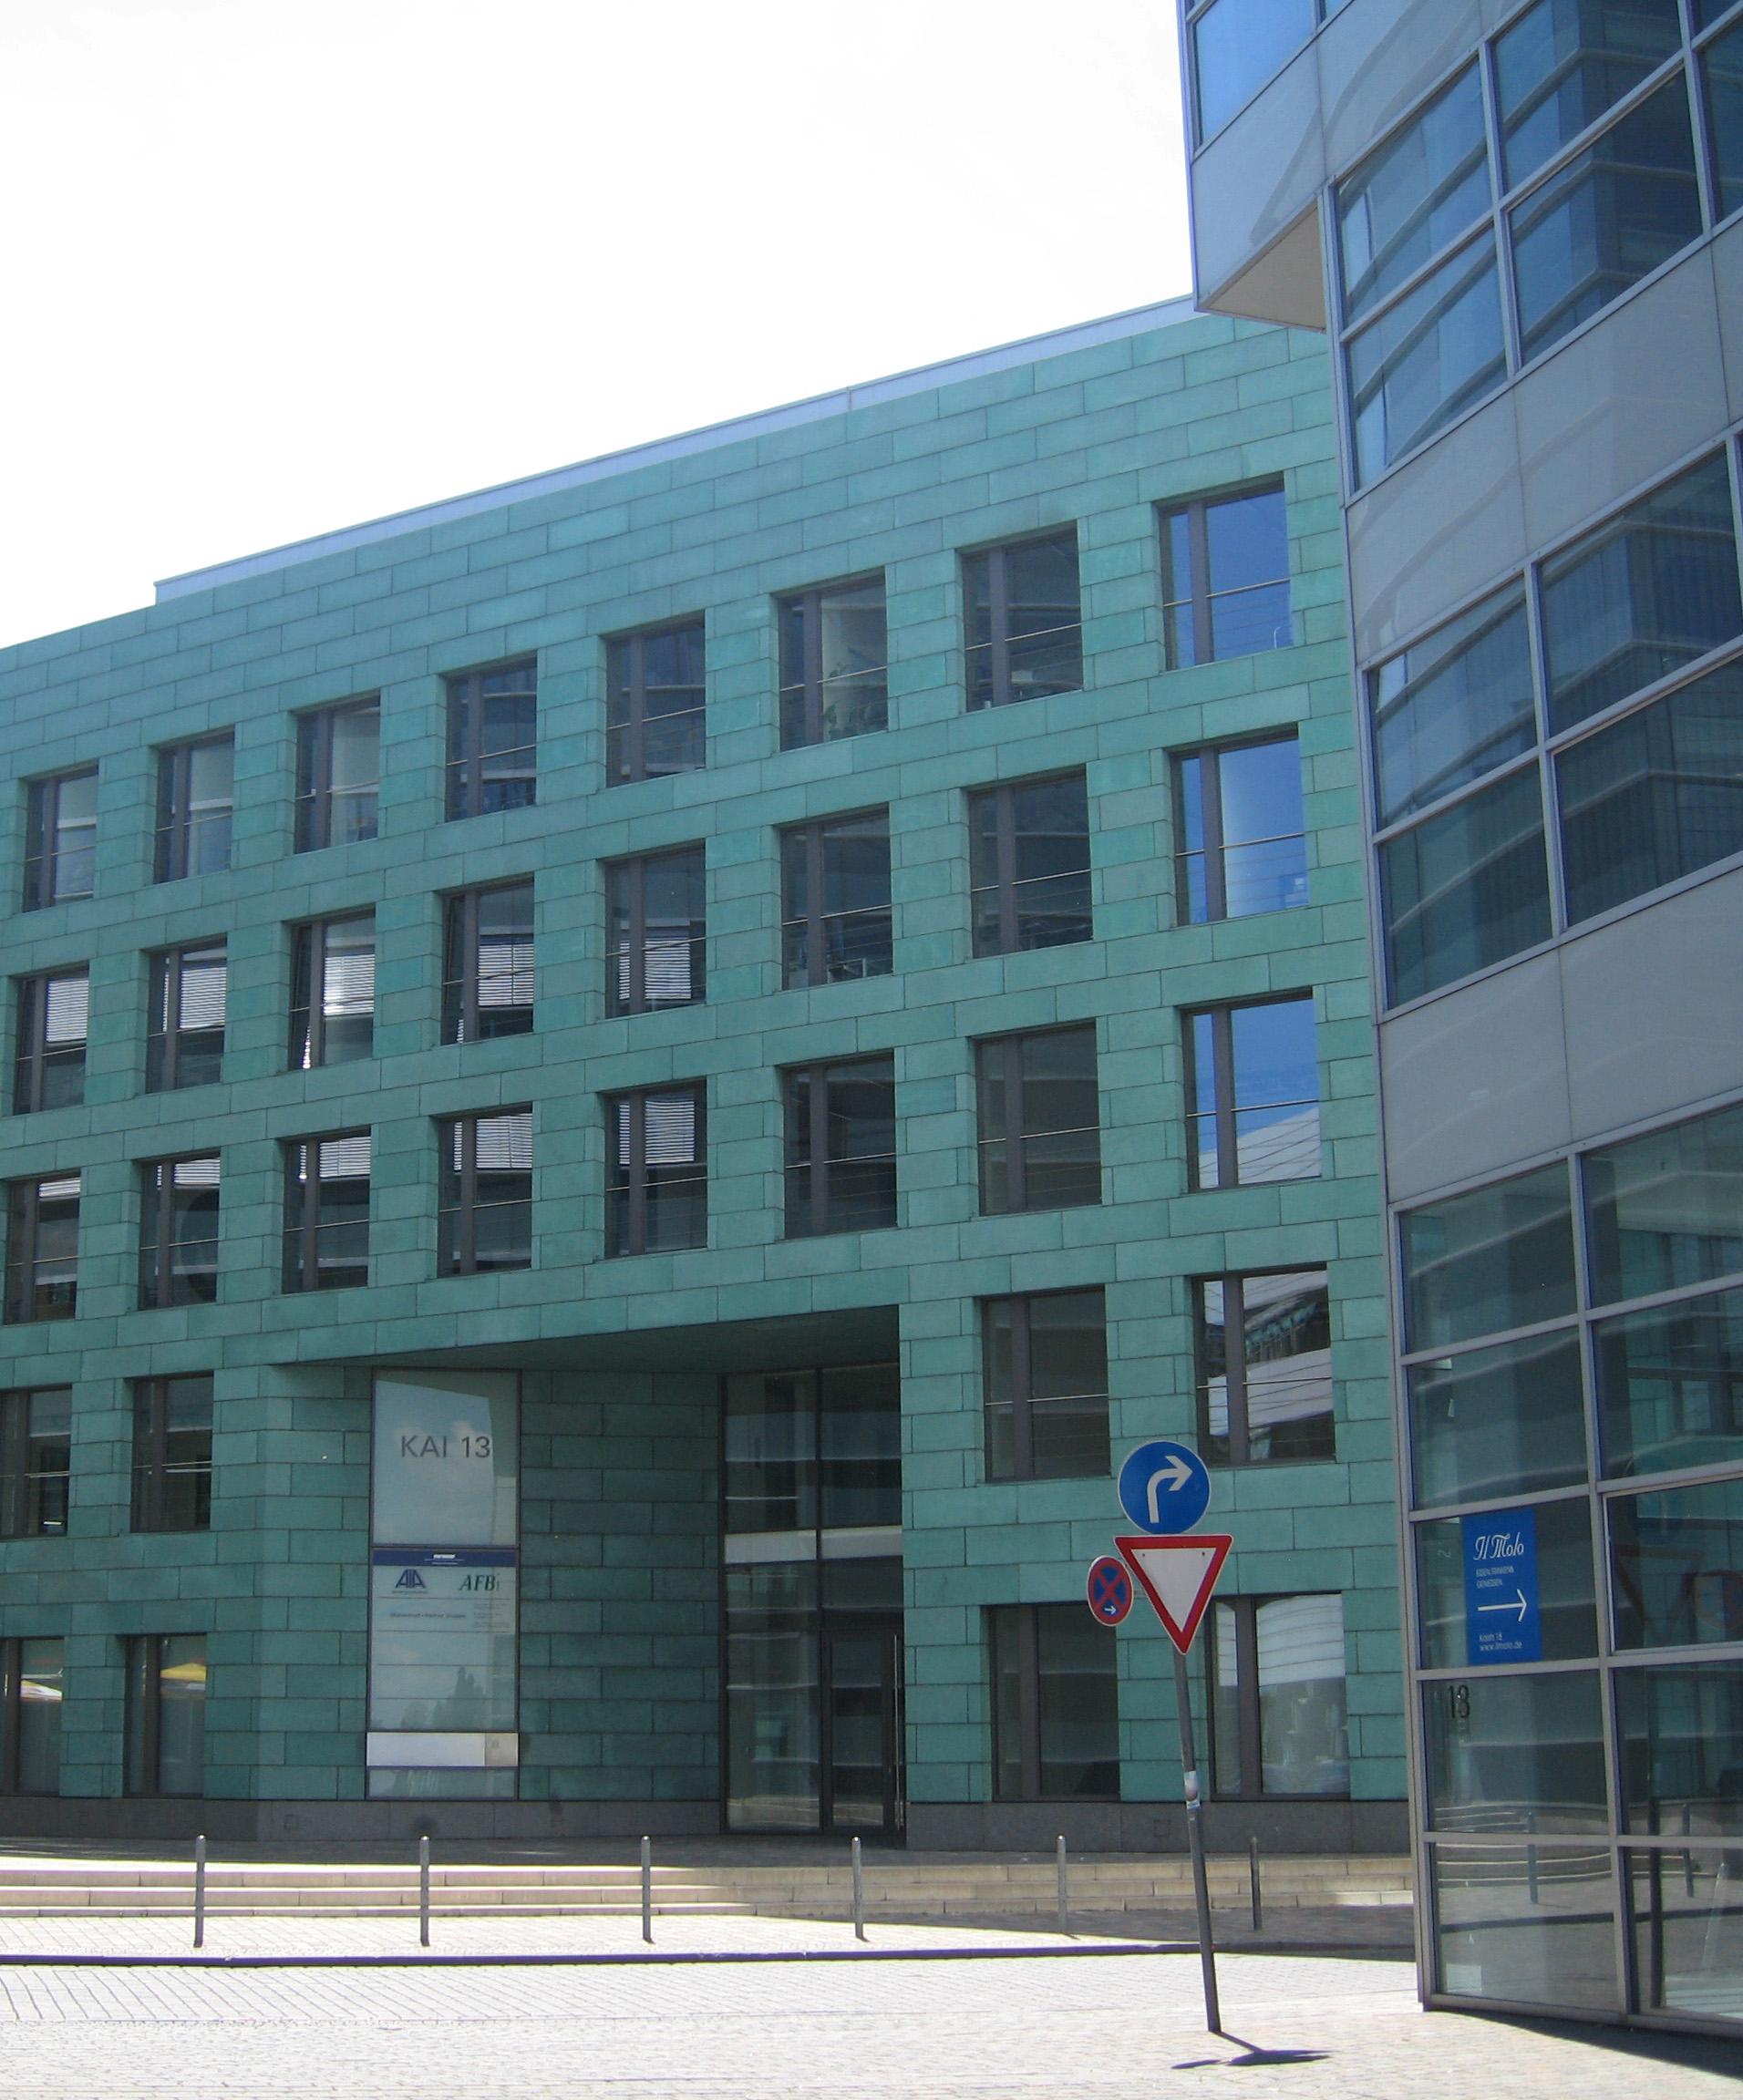 Facciata in rame preossidato verde (Kai 13, Düsseldorf, Germania, DDJ Architekten, 2003)